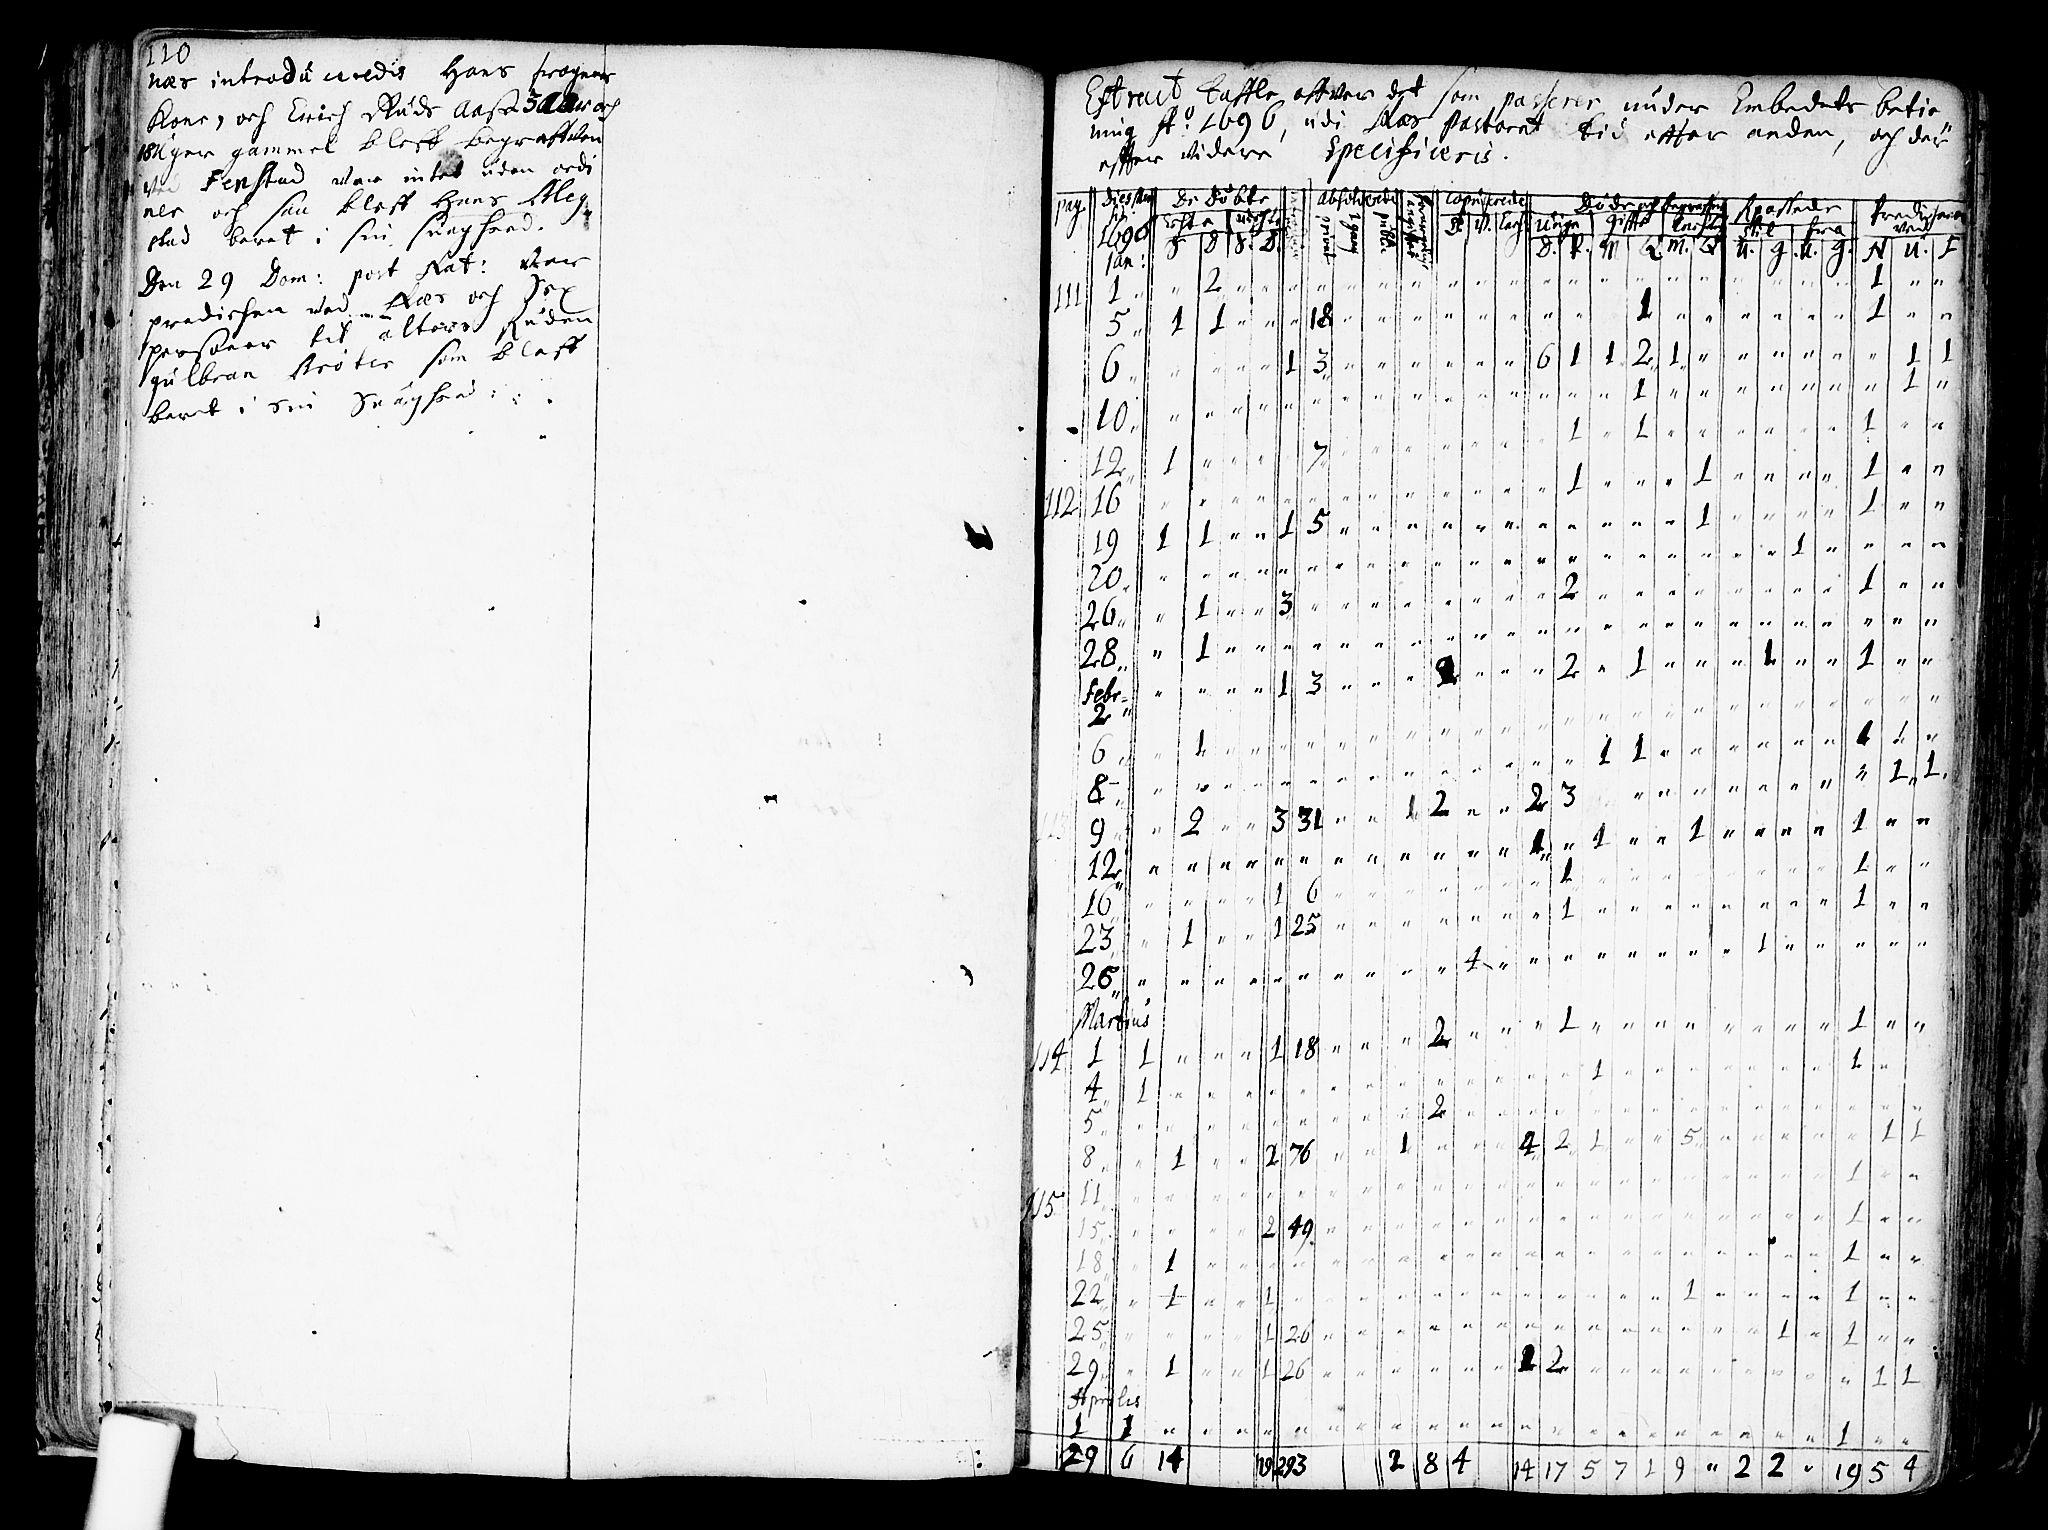 SAO, Nes prestekontor Kirkebøker, F/Fa/L0001: Parish register (official) no. I 1, 1689-1716, p. 110a-110b